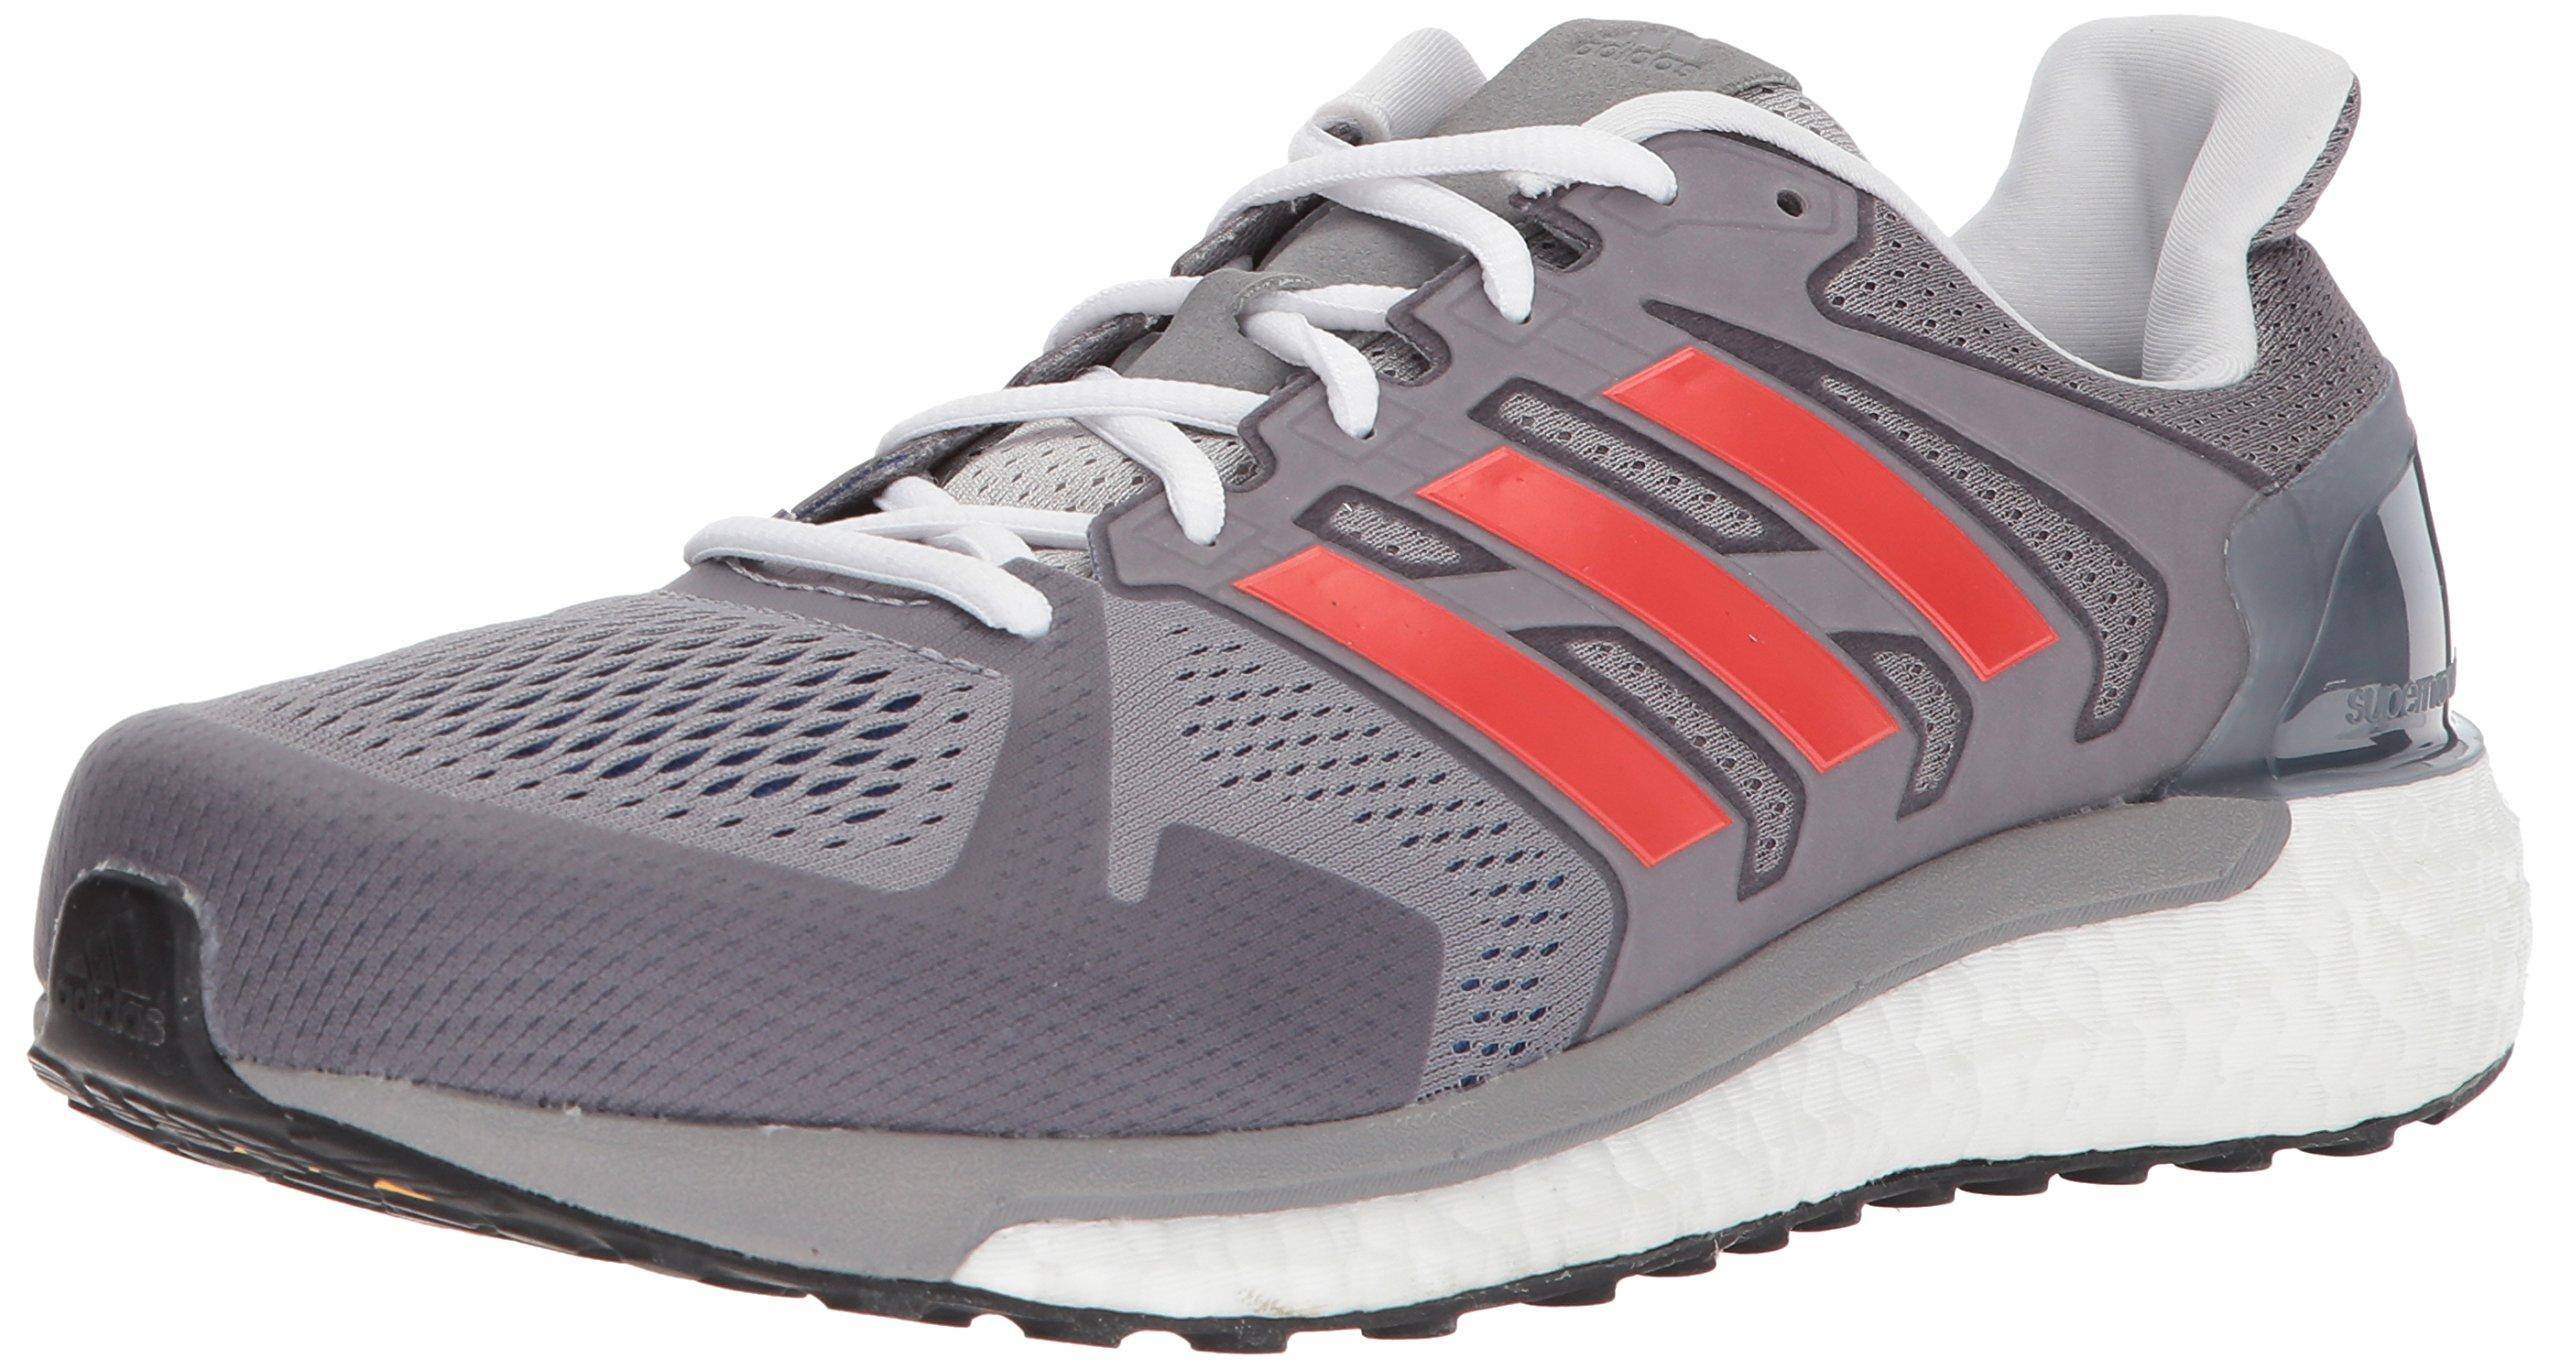 4cd6a30012657 Galleon - Adidas Performance Men s Supernova ST Aktiv Running Shoe ...